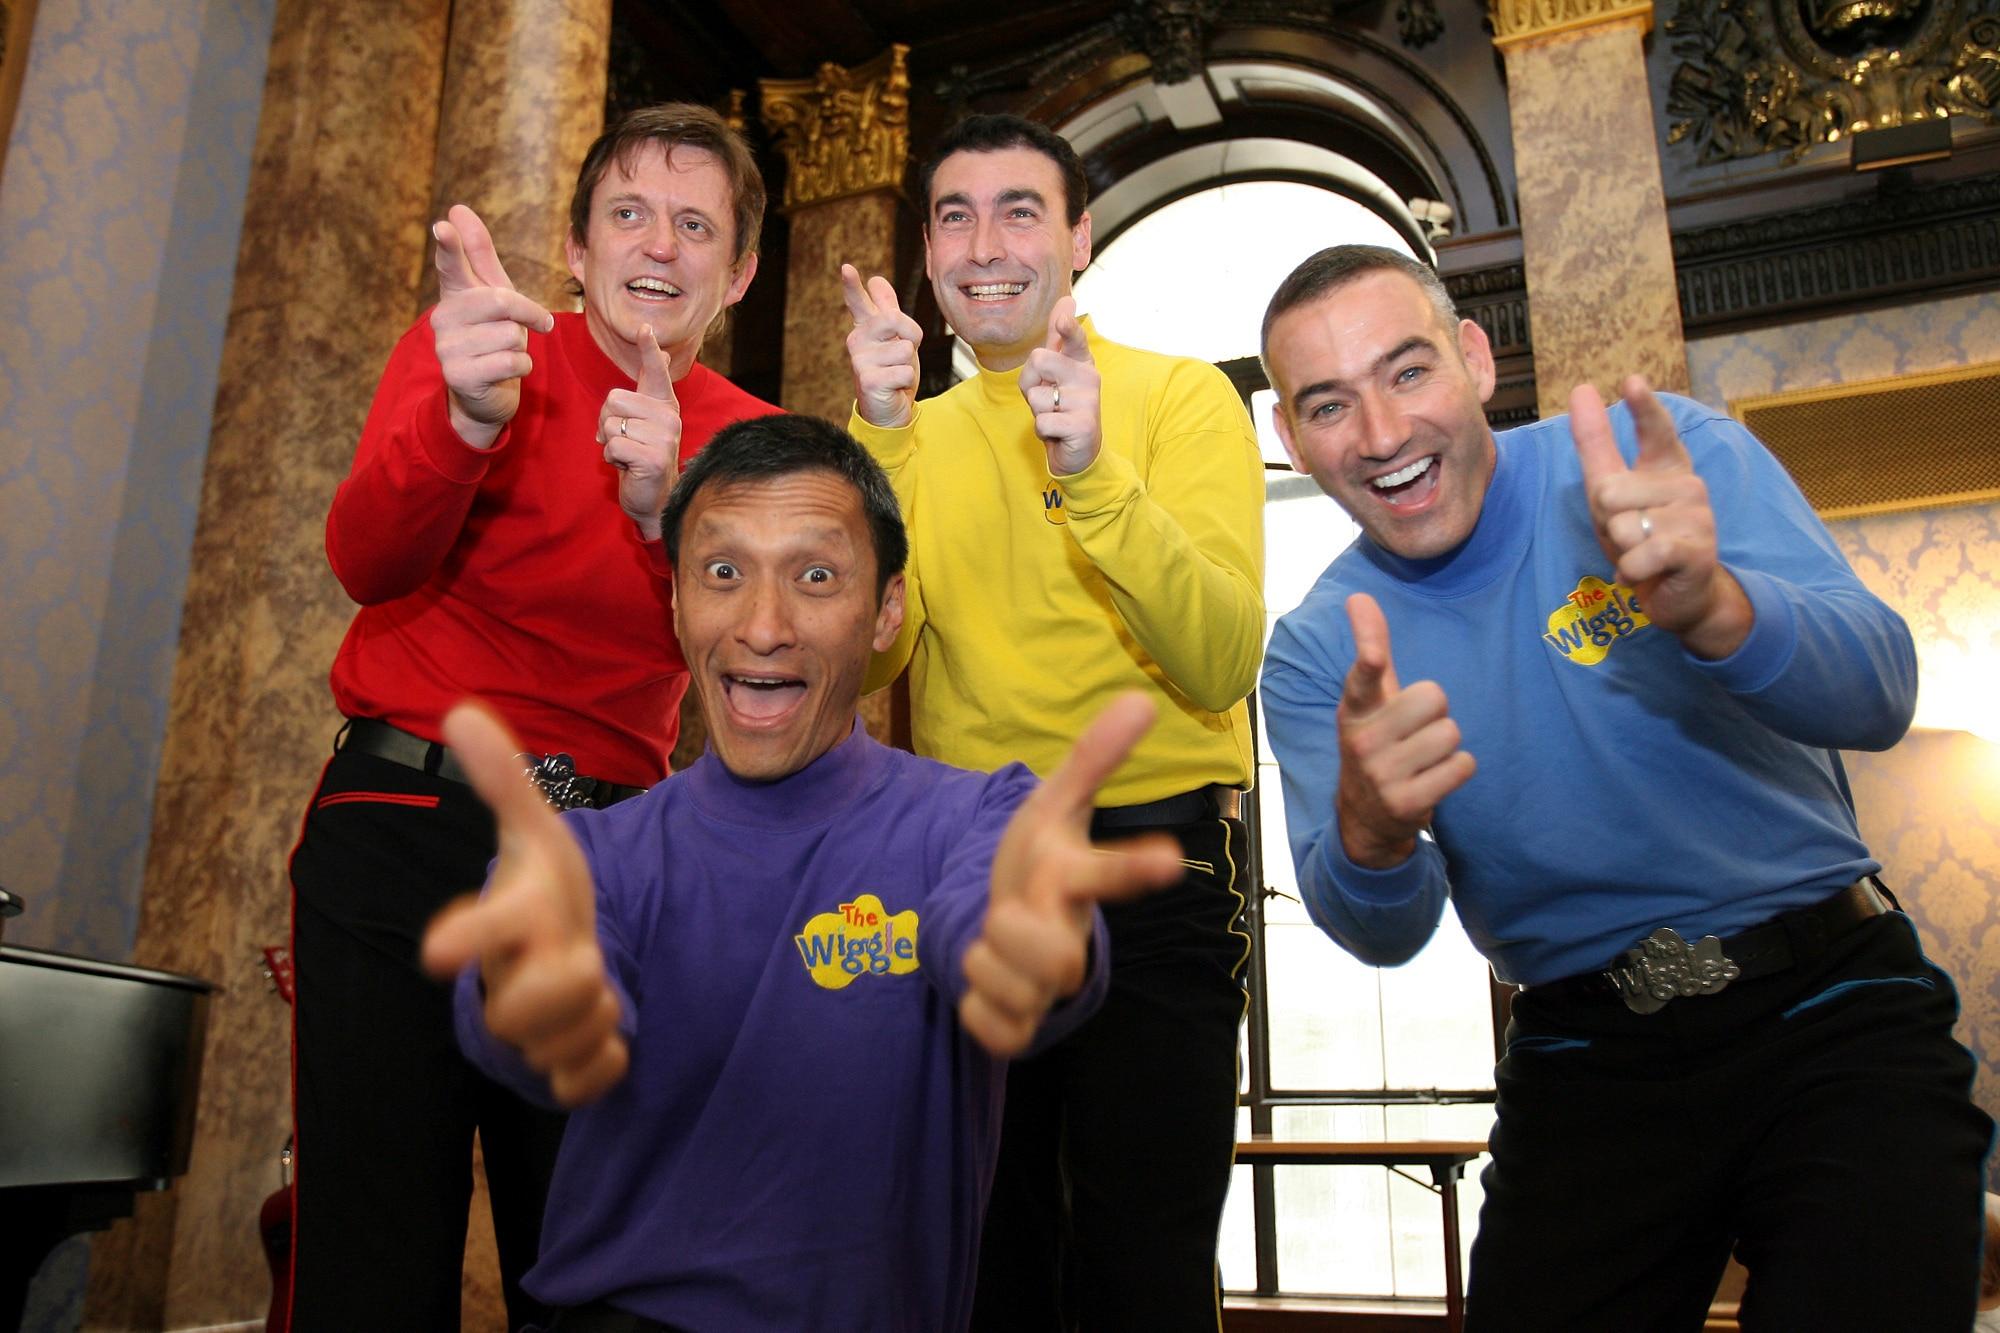 Australian children's entertainers The Wiggles, Murray Cook (Red Wiggle), Greg Page (Yellow Wiggle), Jeff Fatt (Purple Wiggle),